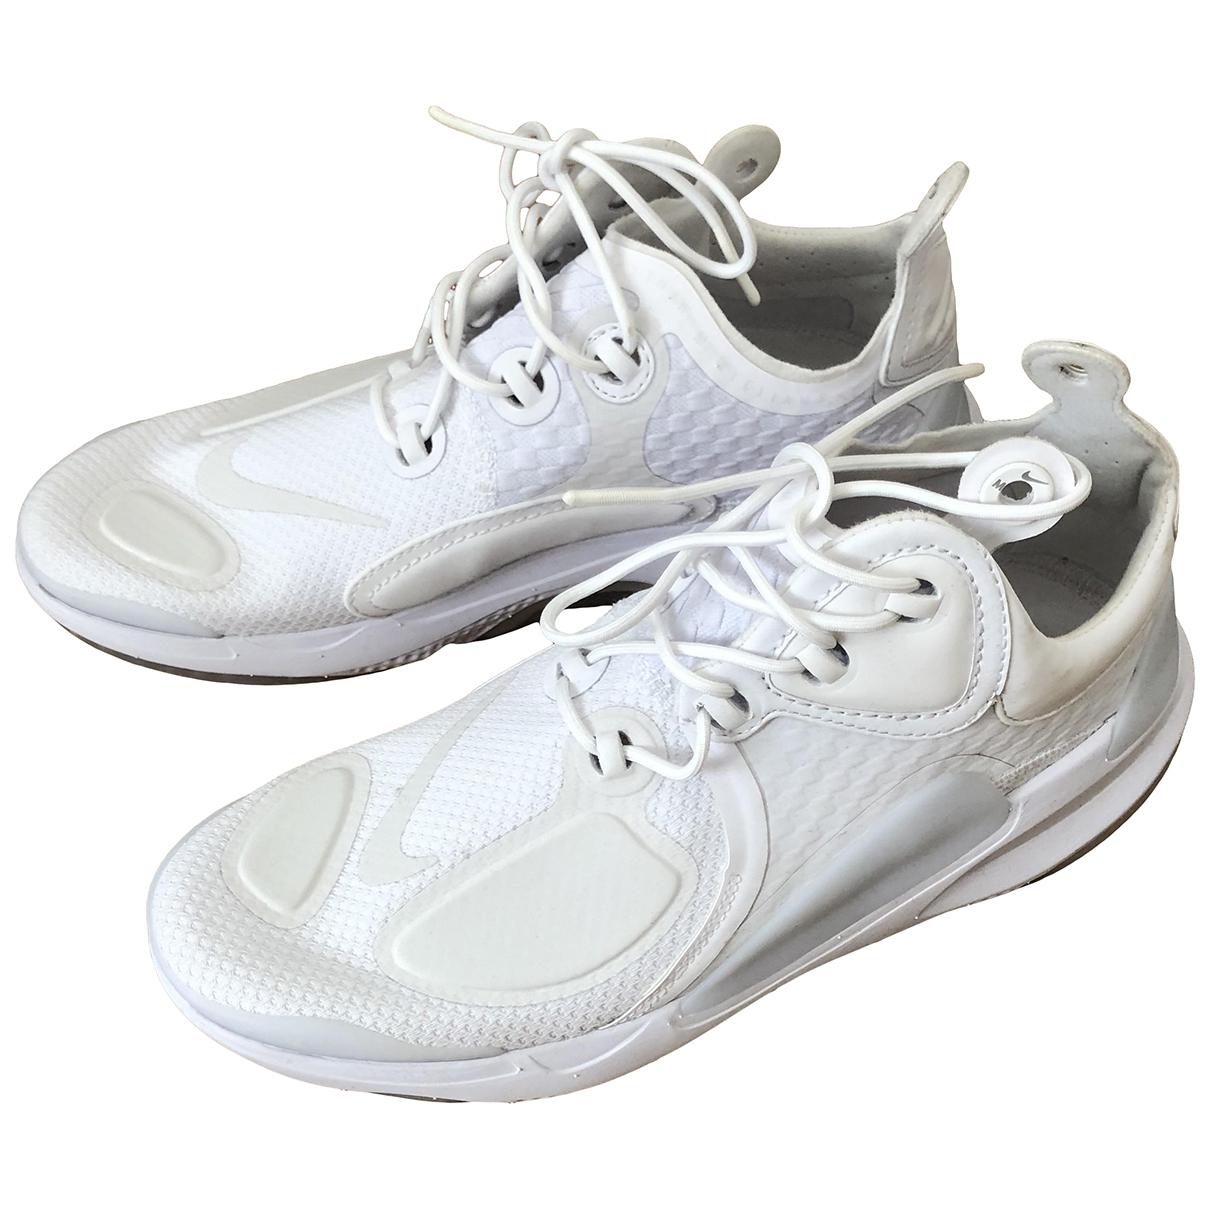 Deportivas de Lona Nike X Alyx